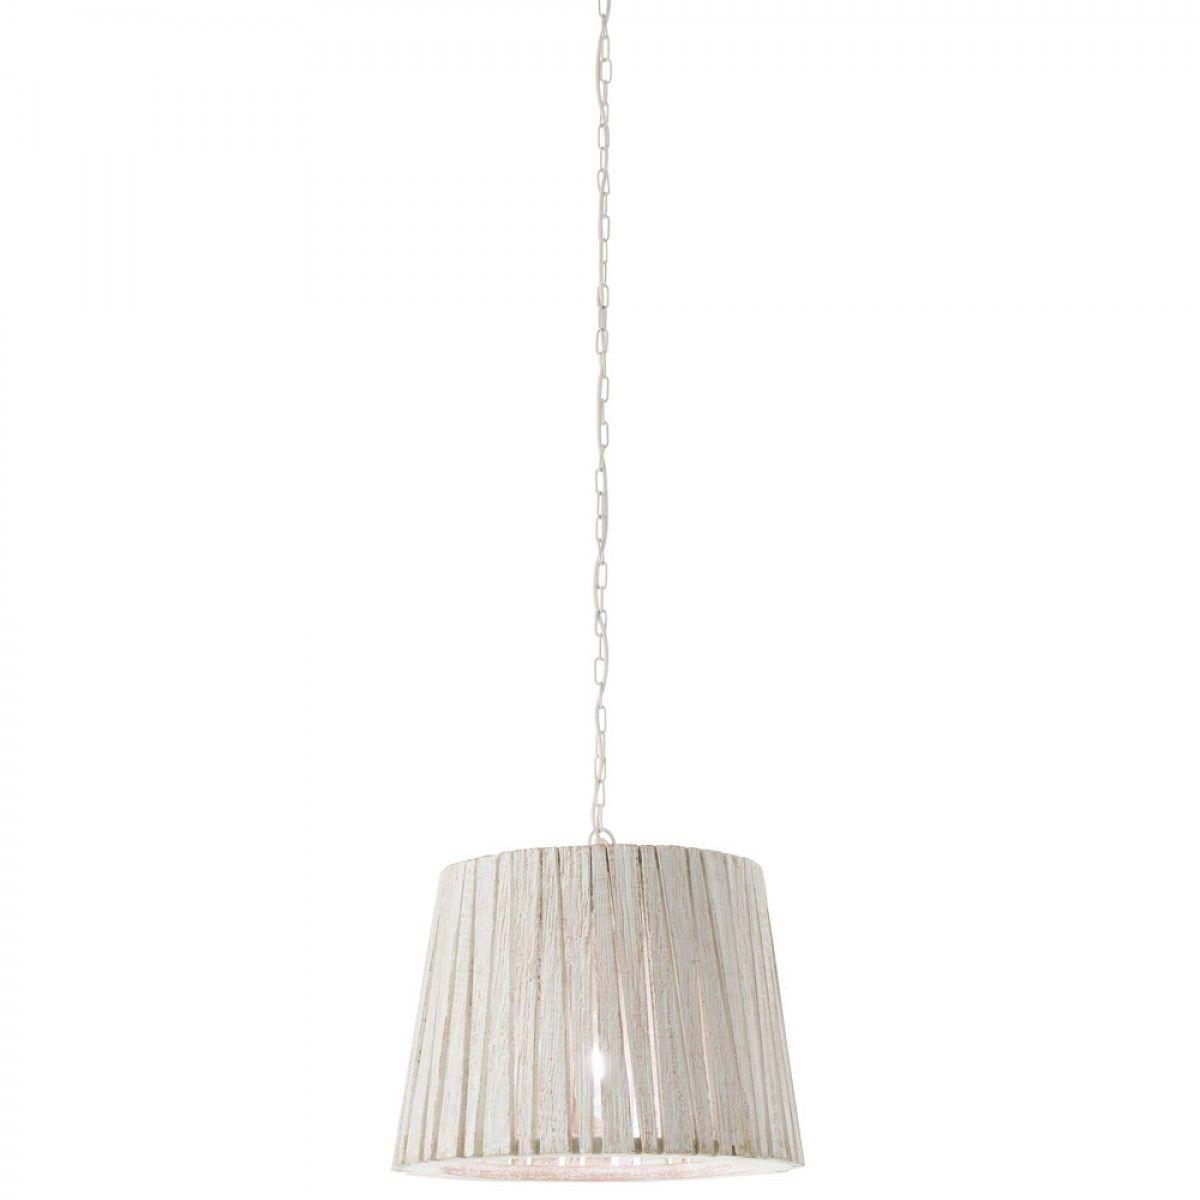 Amara White Wash Timber Pendant - Pendant Lights - Lighting u0026 Fans  sc 1 st  Pinterest & Amara White Wash Timber Pendant - Pendant Lights - Lighting u0026 Fans ...